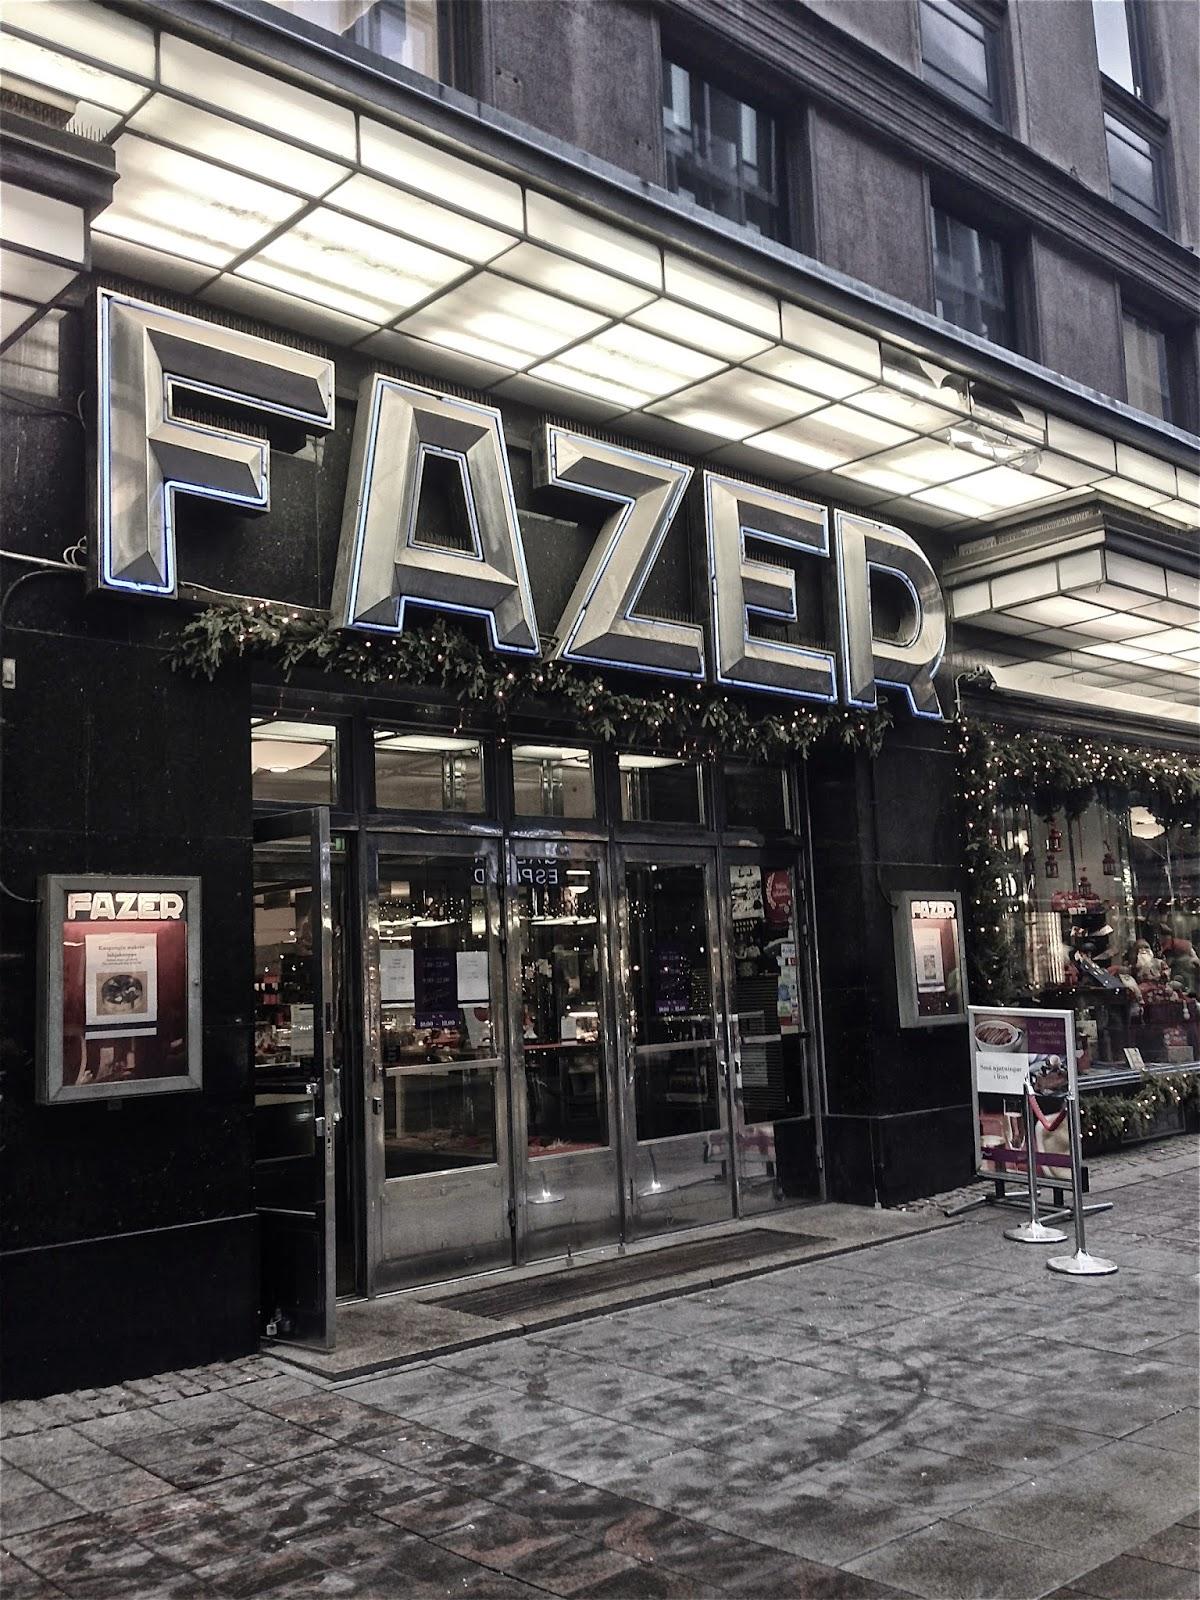 Fazer, Karl Fazer, Kluuvikatu, Glogatan, Café, Shop